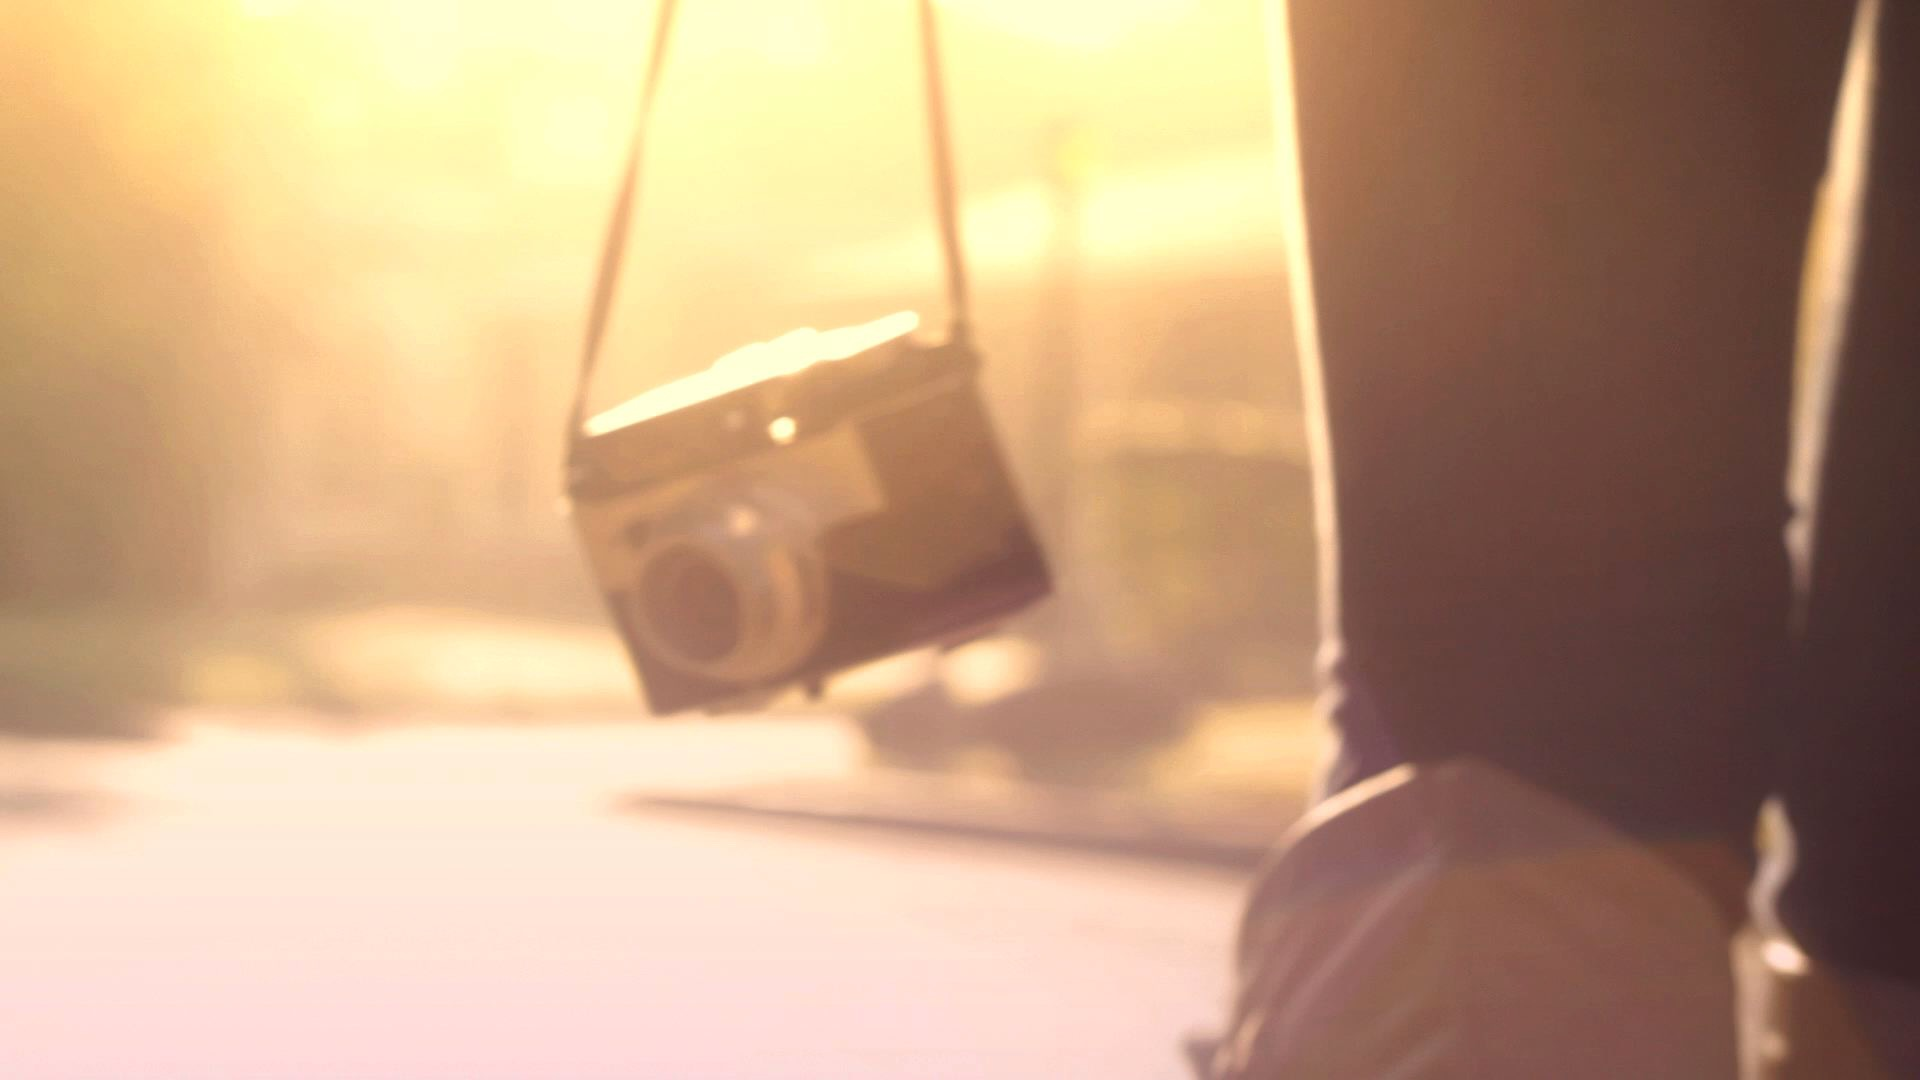 Burn Away music video image